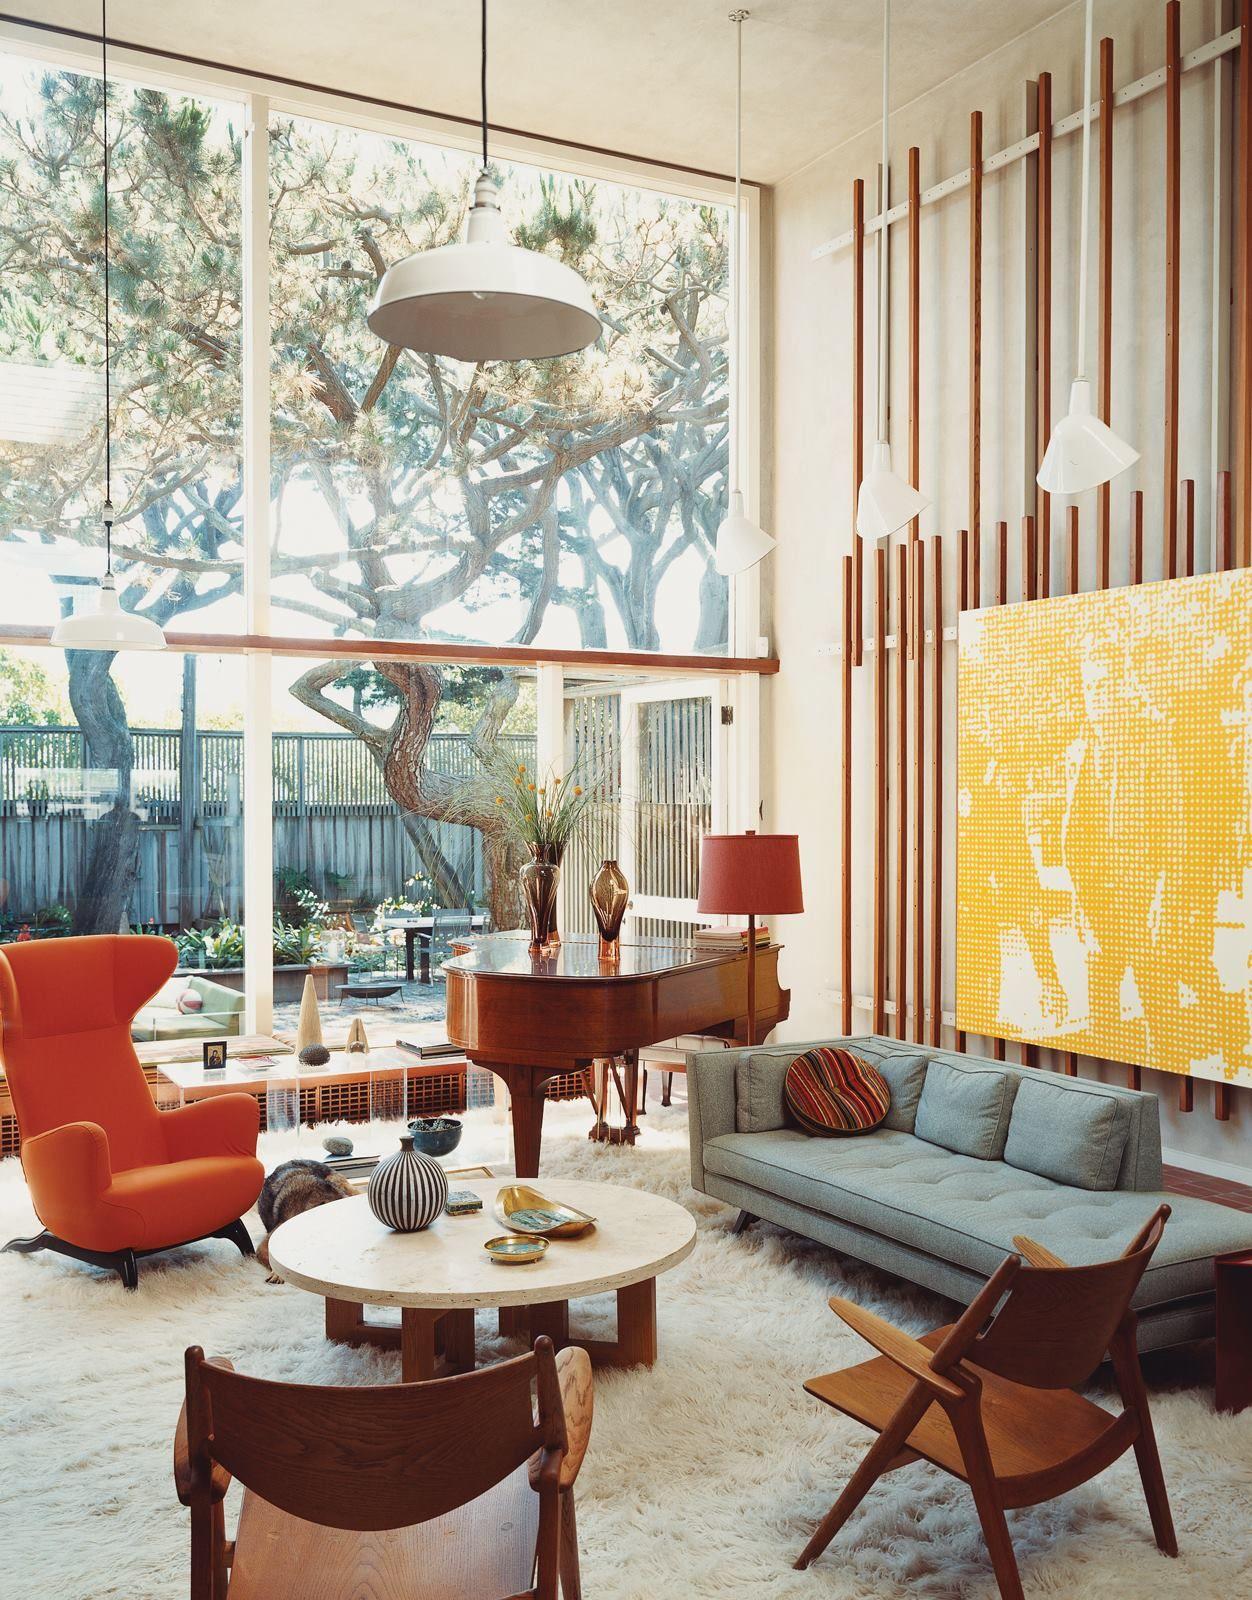 American Beach House W Courtyard Mid Century Modern Interiors